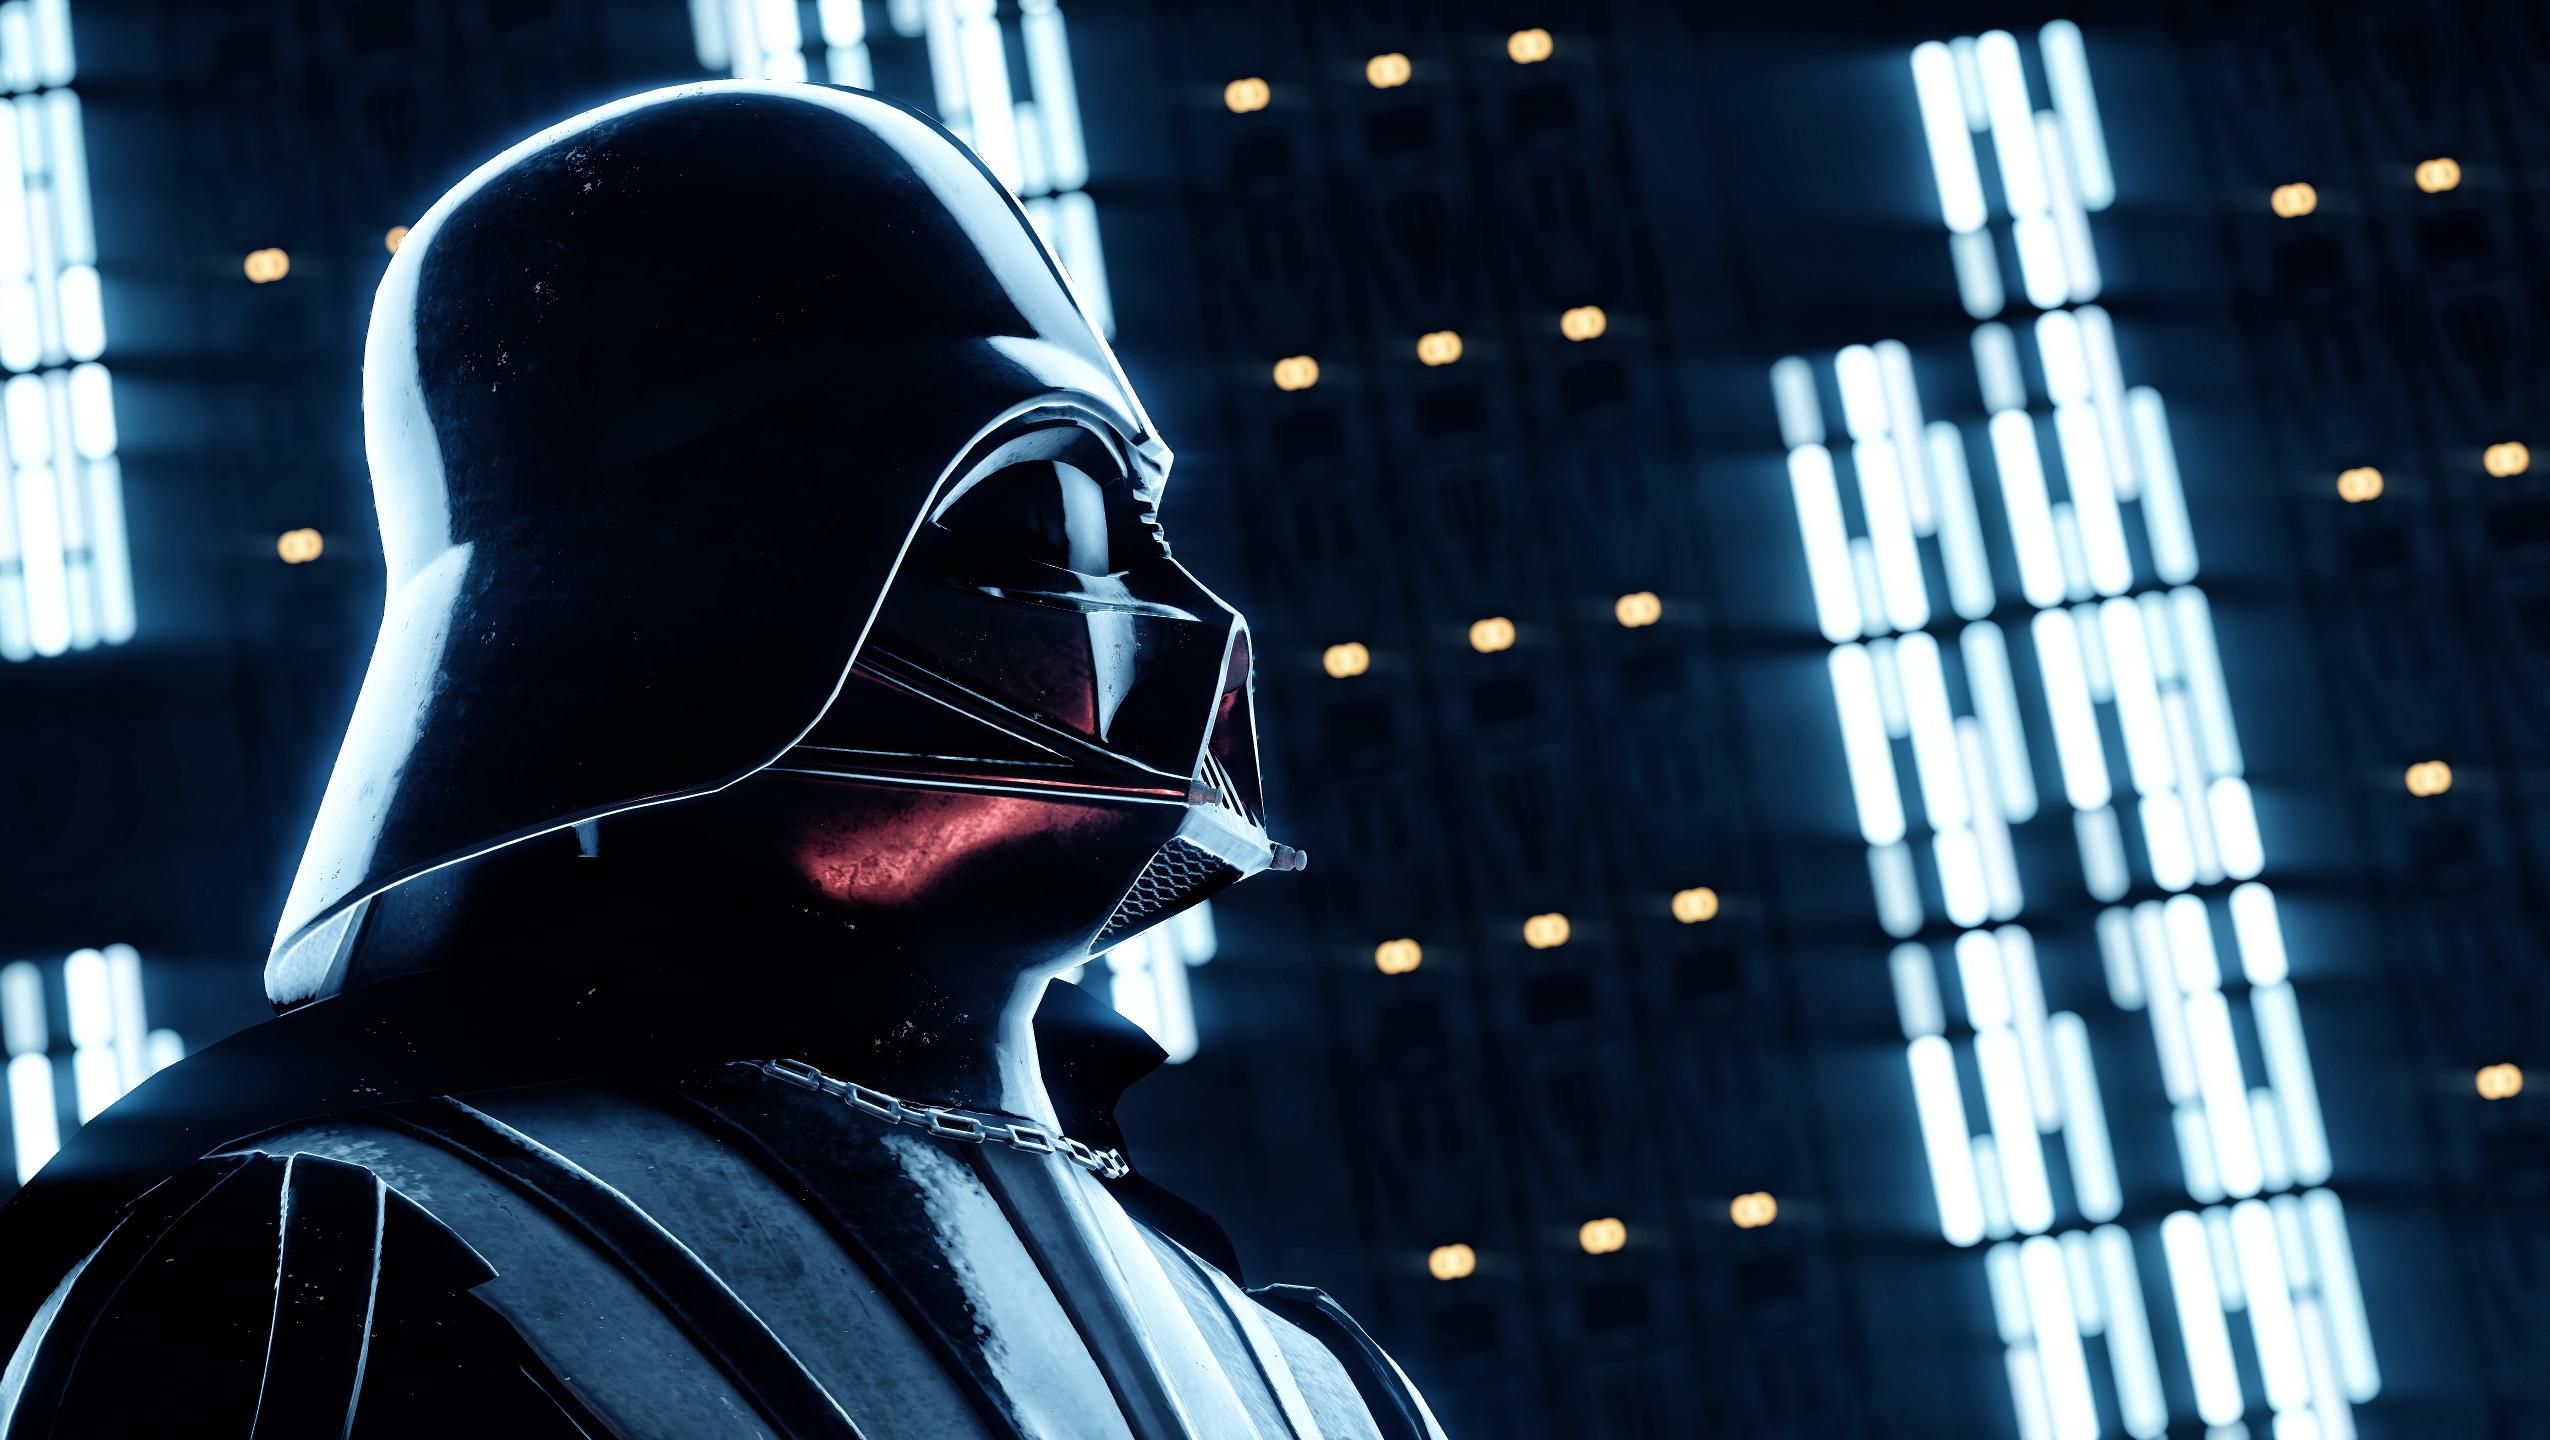 Star Wars Battlefront II Video Games Darth Vader